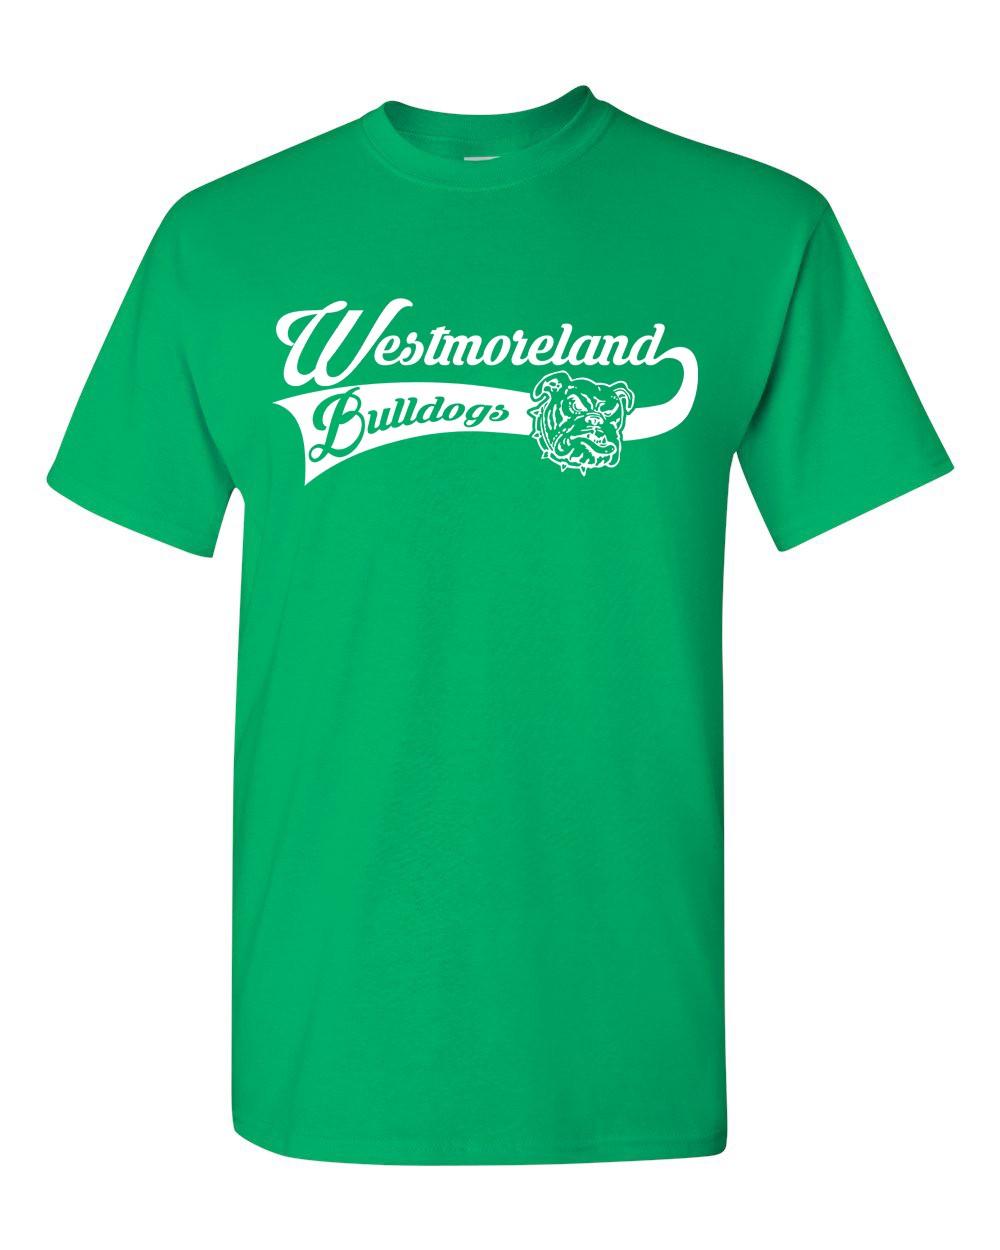 Gildan Westmoreland Swoosh Logo Tees